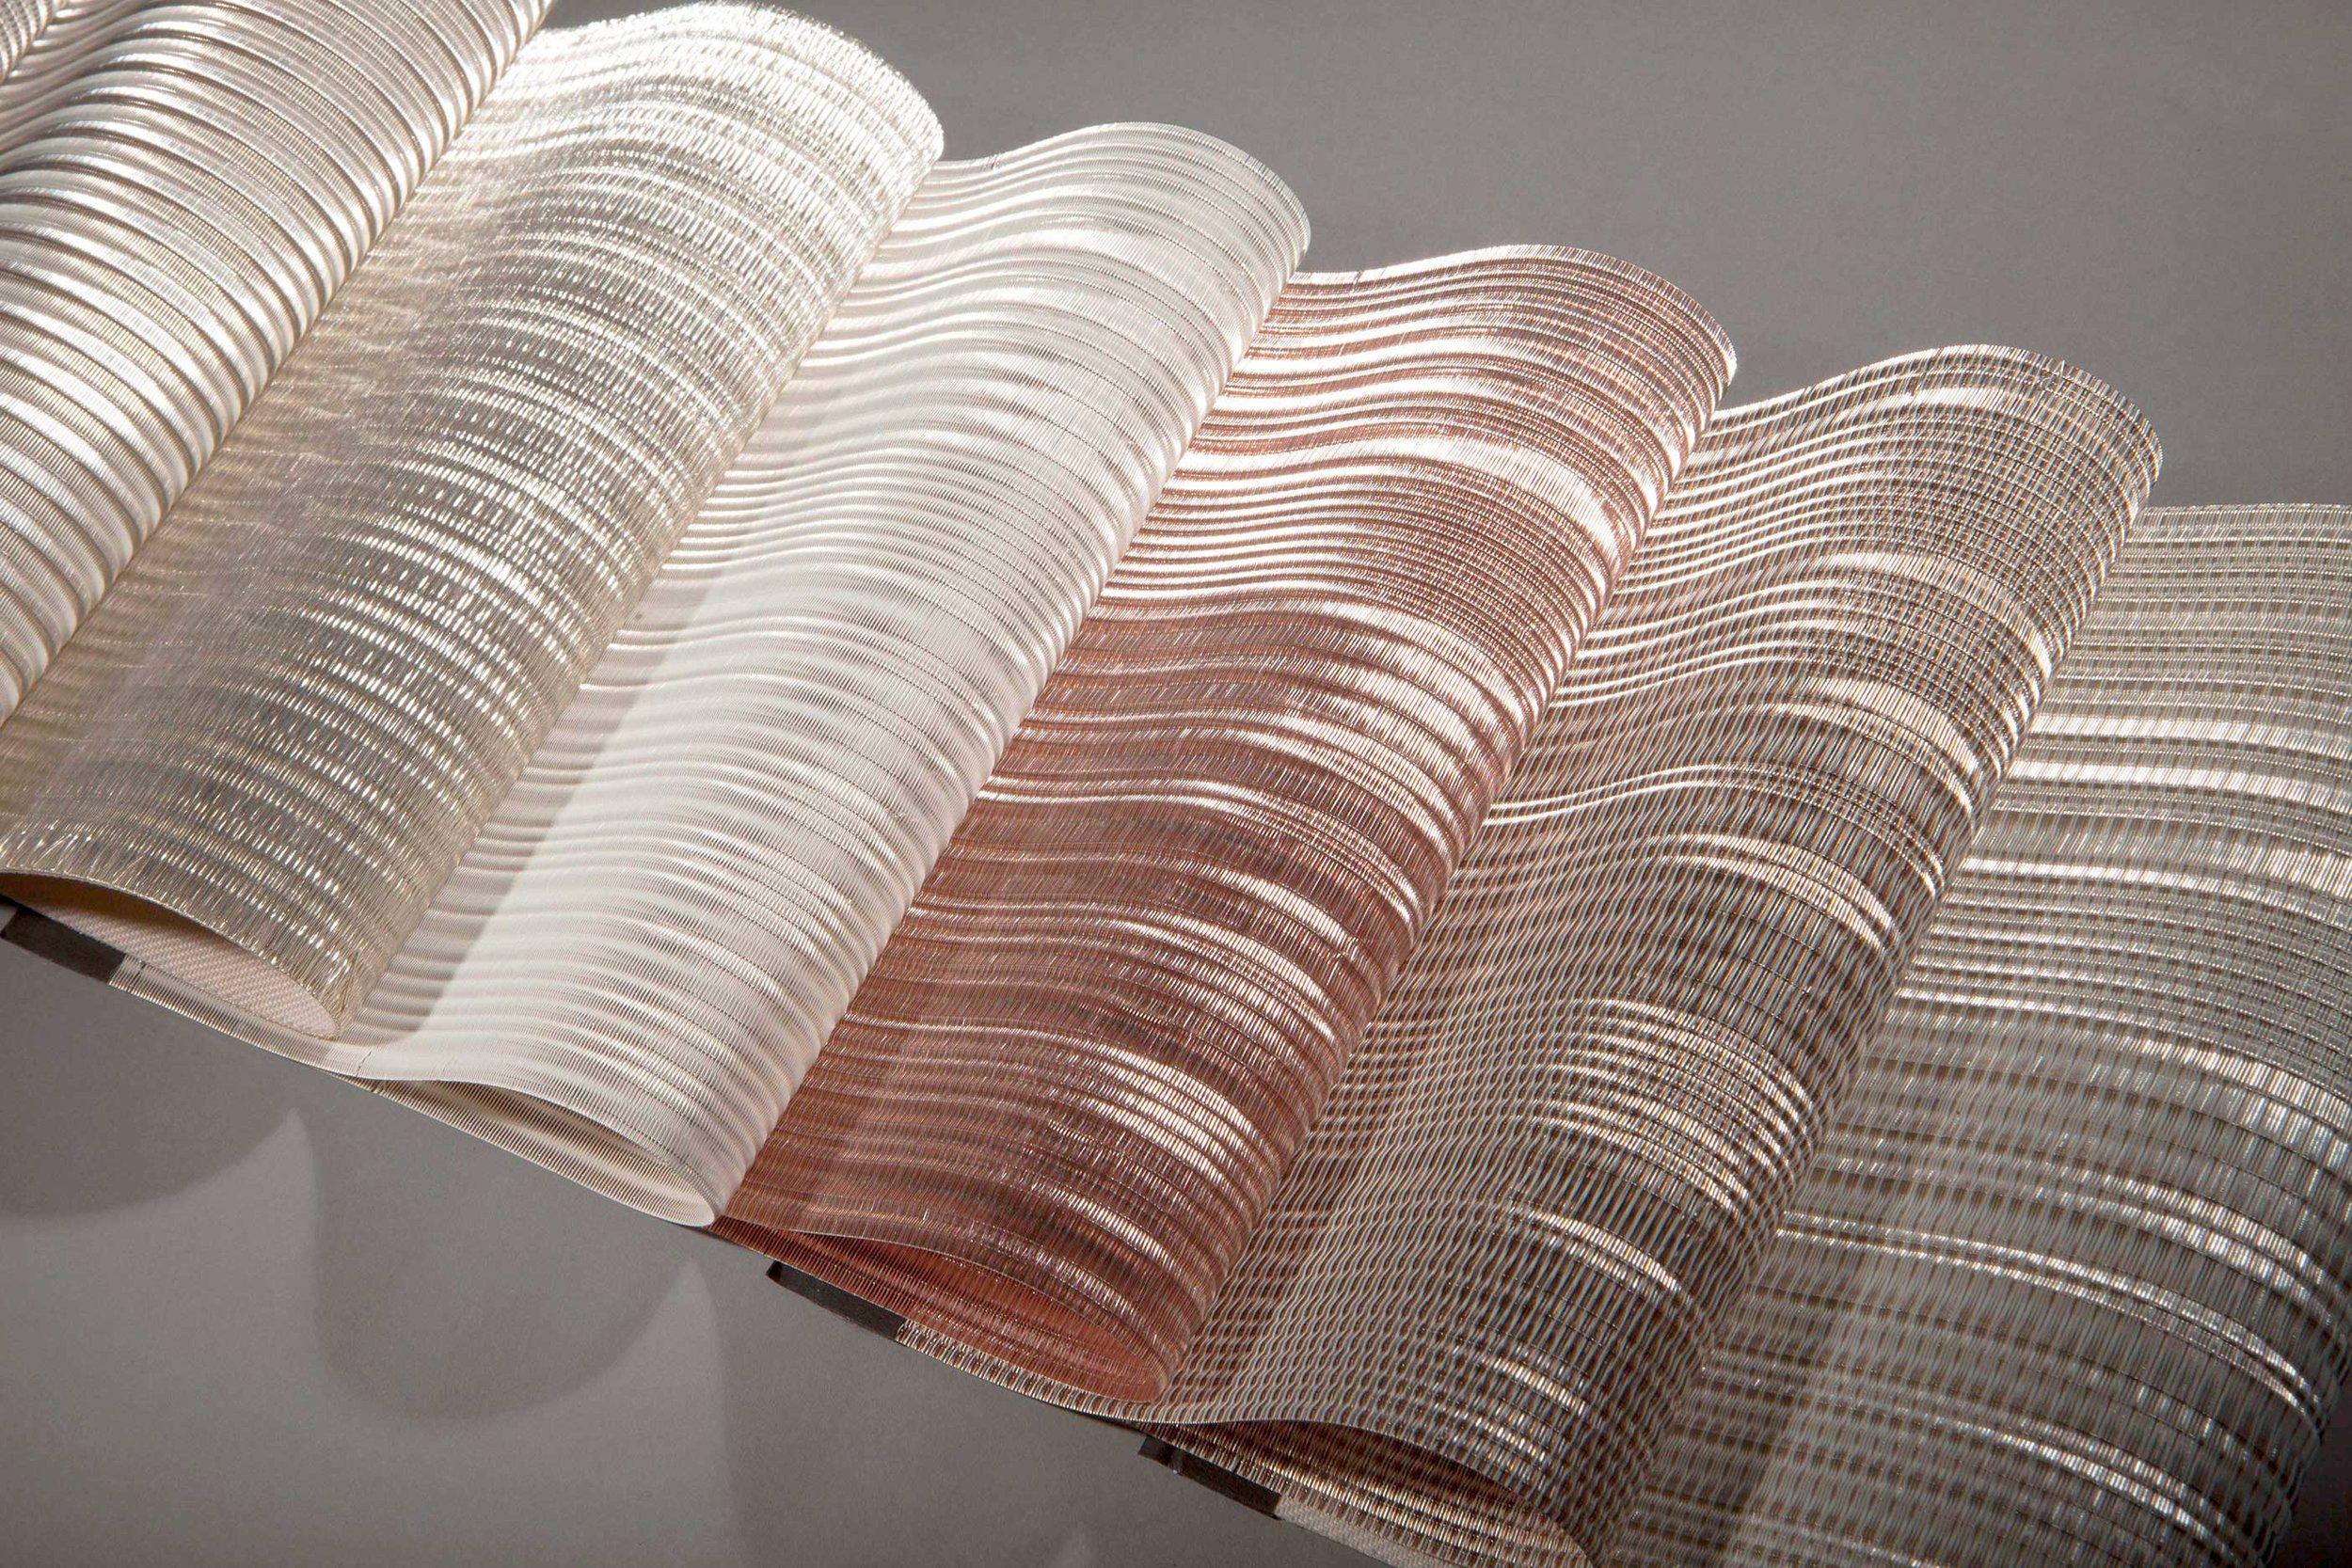 Woven Metal Interiors -